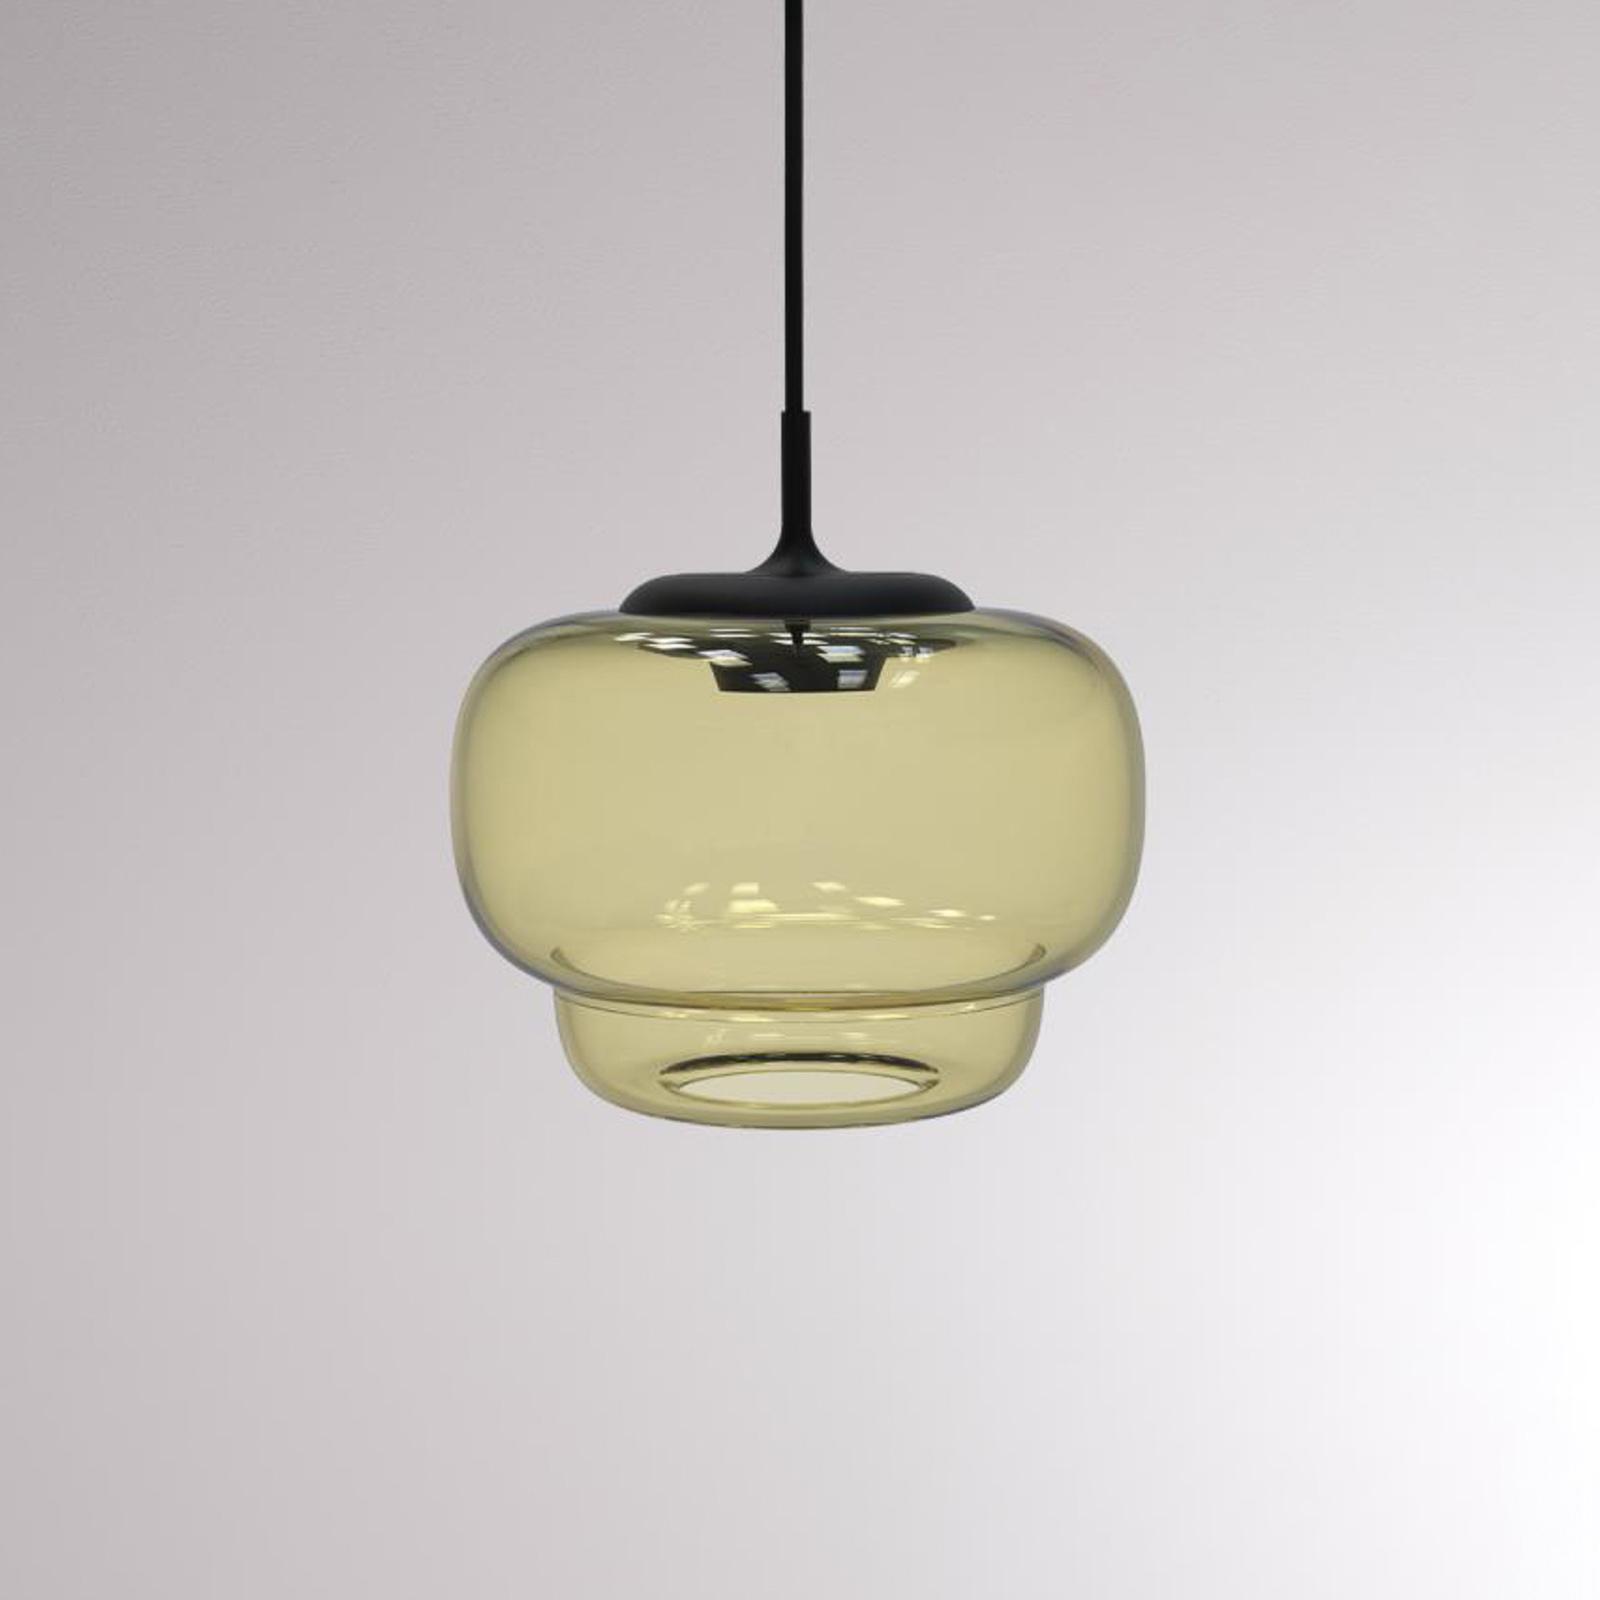 LOUM Canna LED-hængelampe, Ø 21 cm, champagne